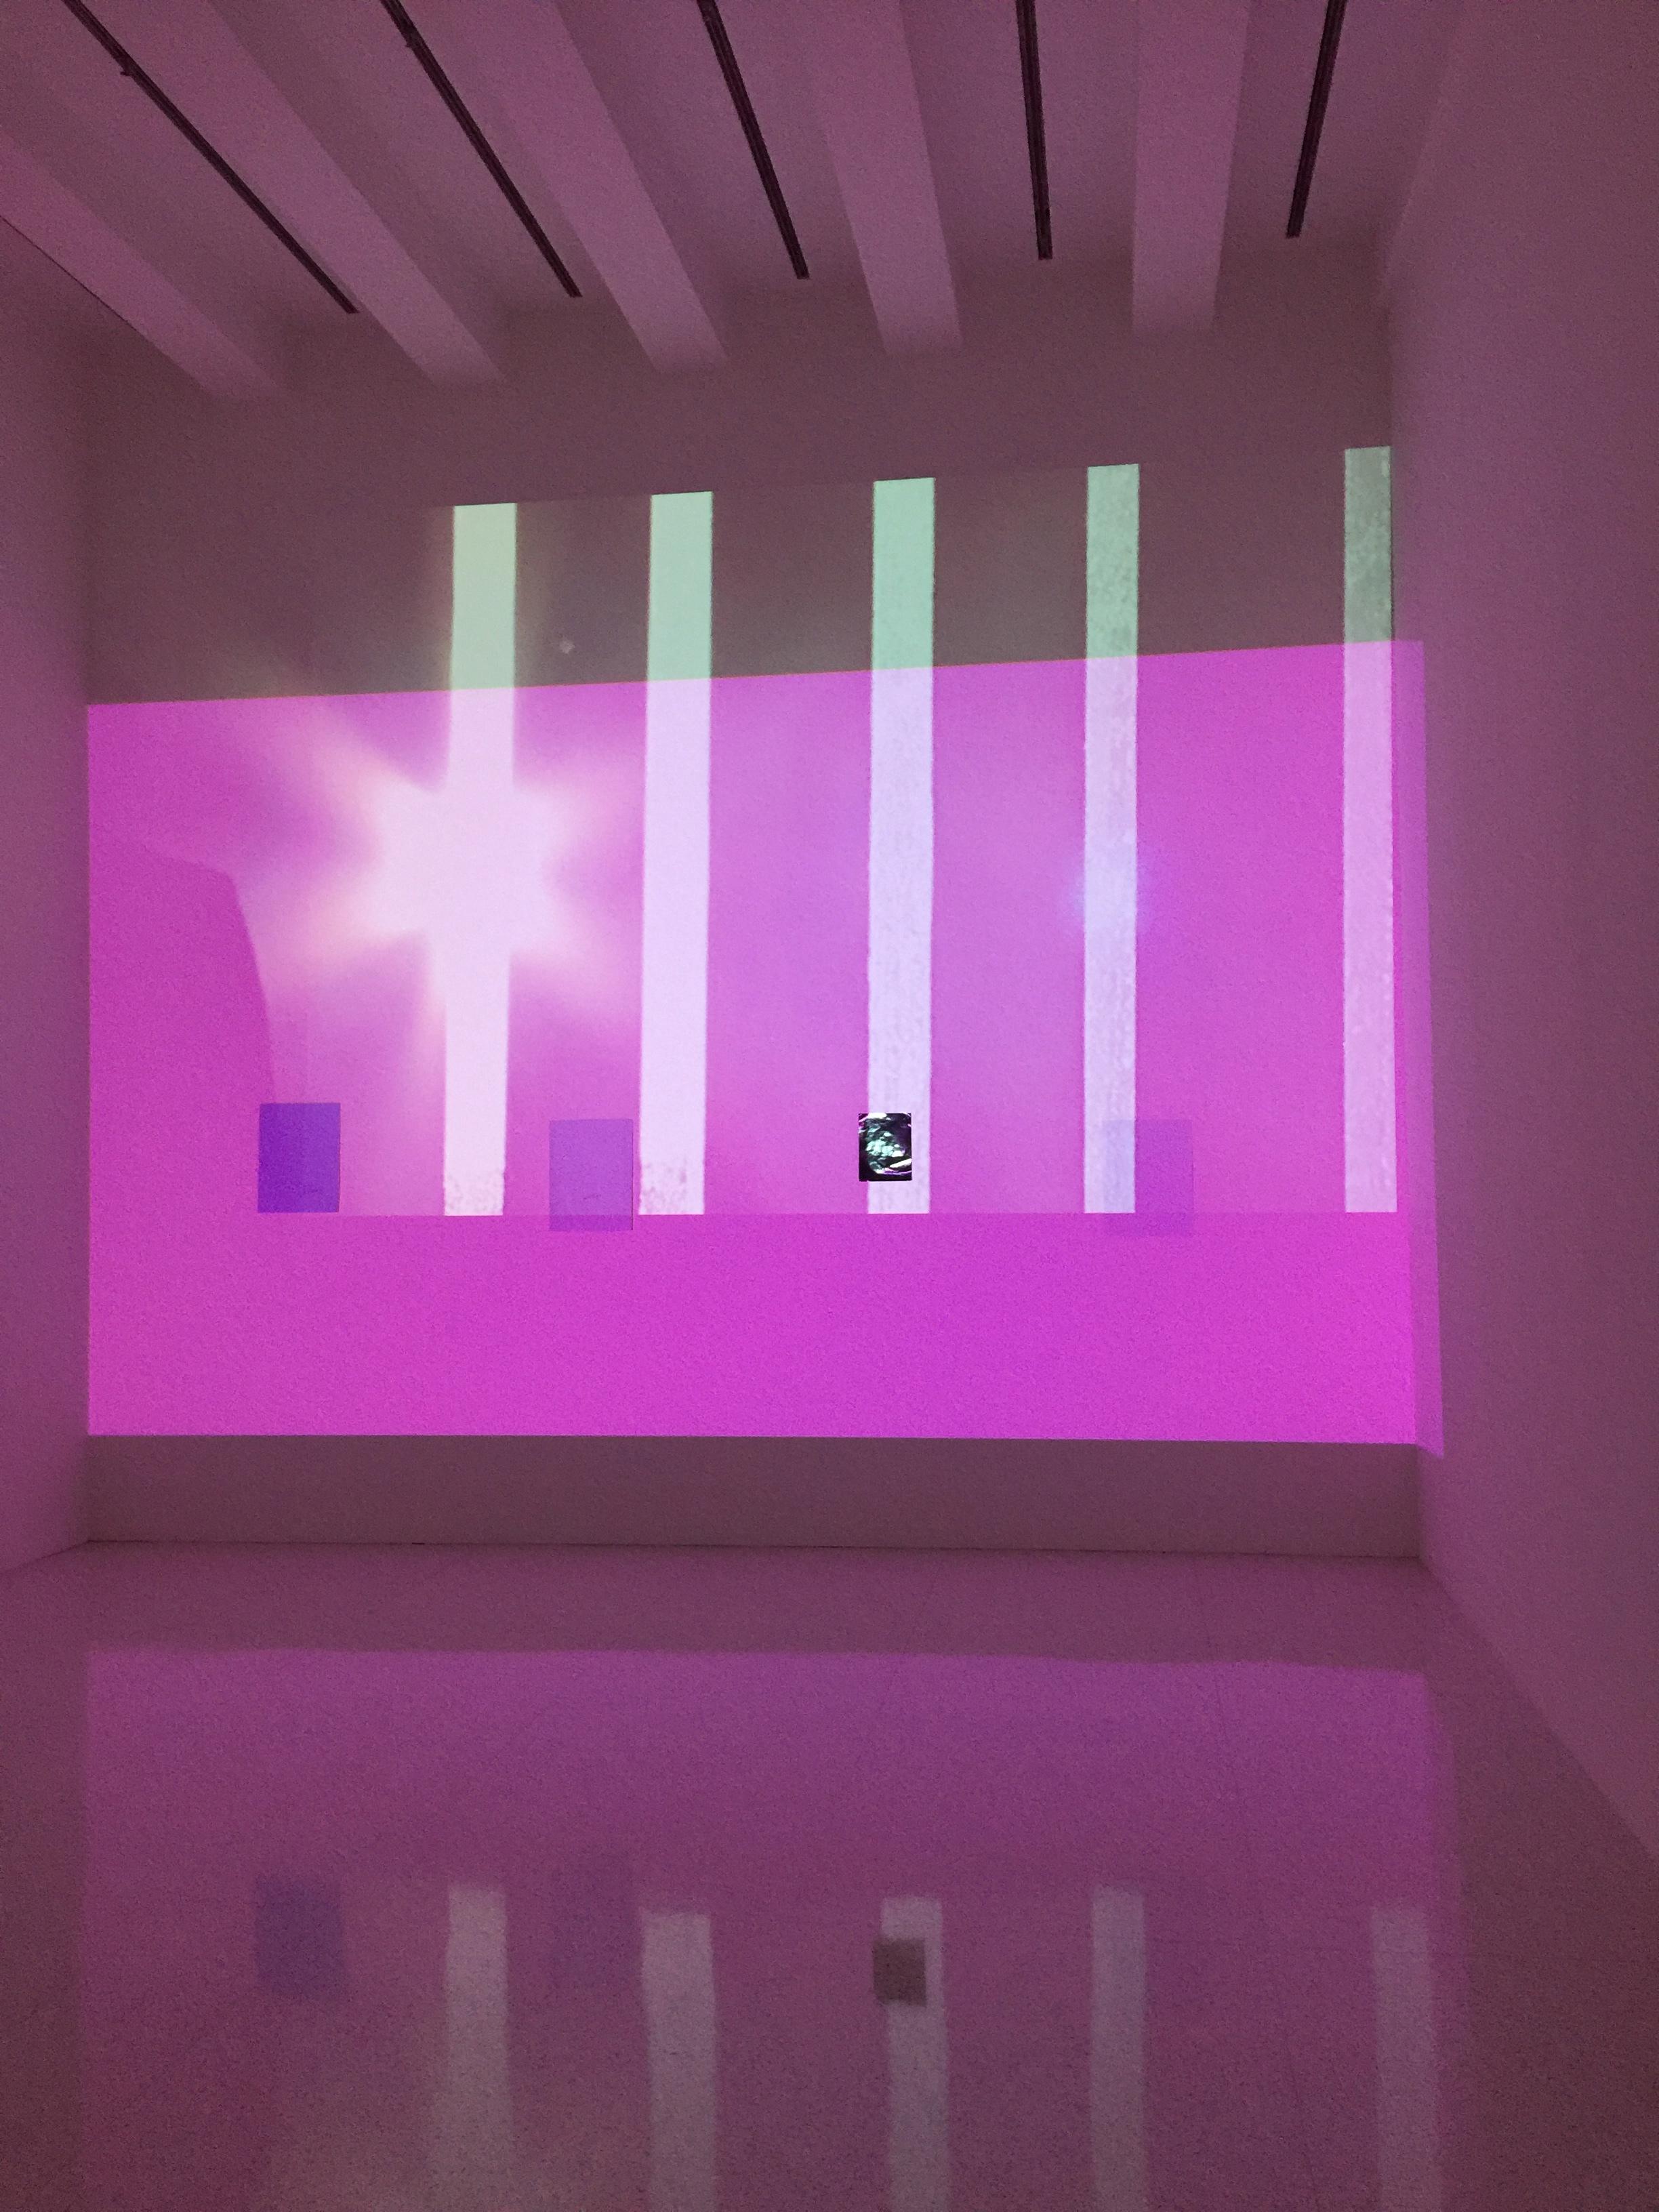 Installation view, Lee Kit: Hold your breath, dance slowly, Walker Art Center, Minneapolis, 2016.